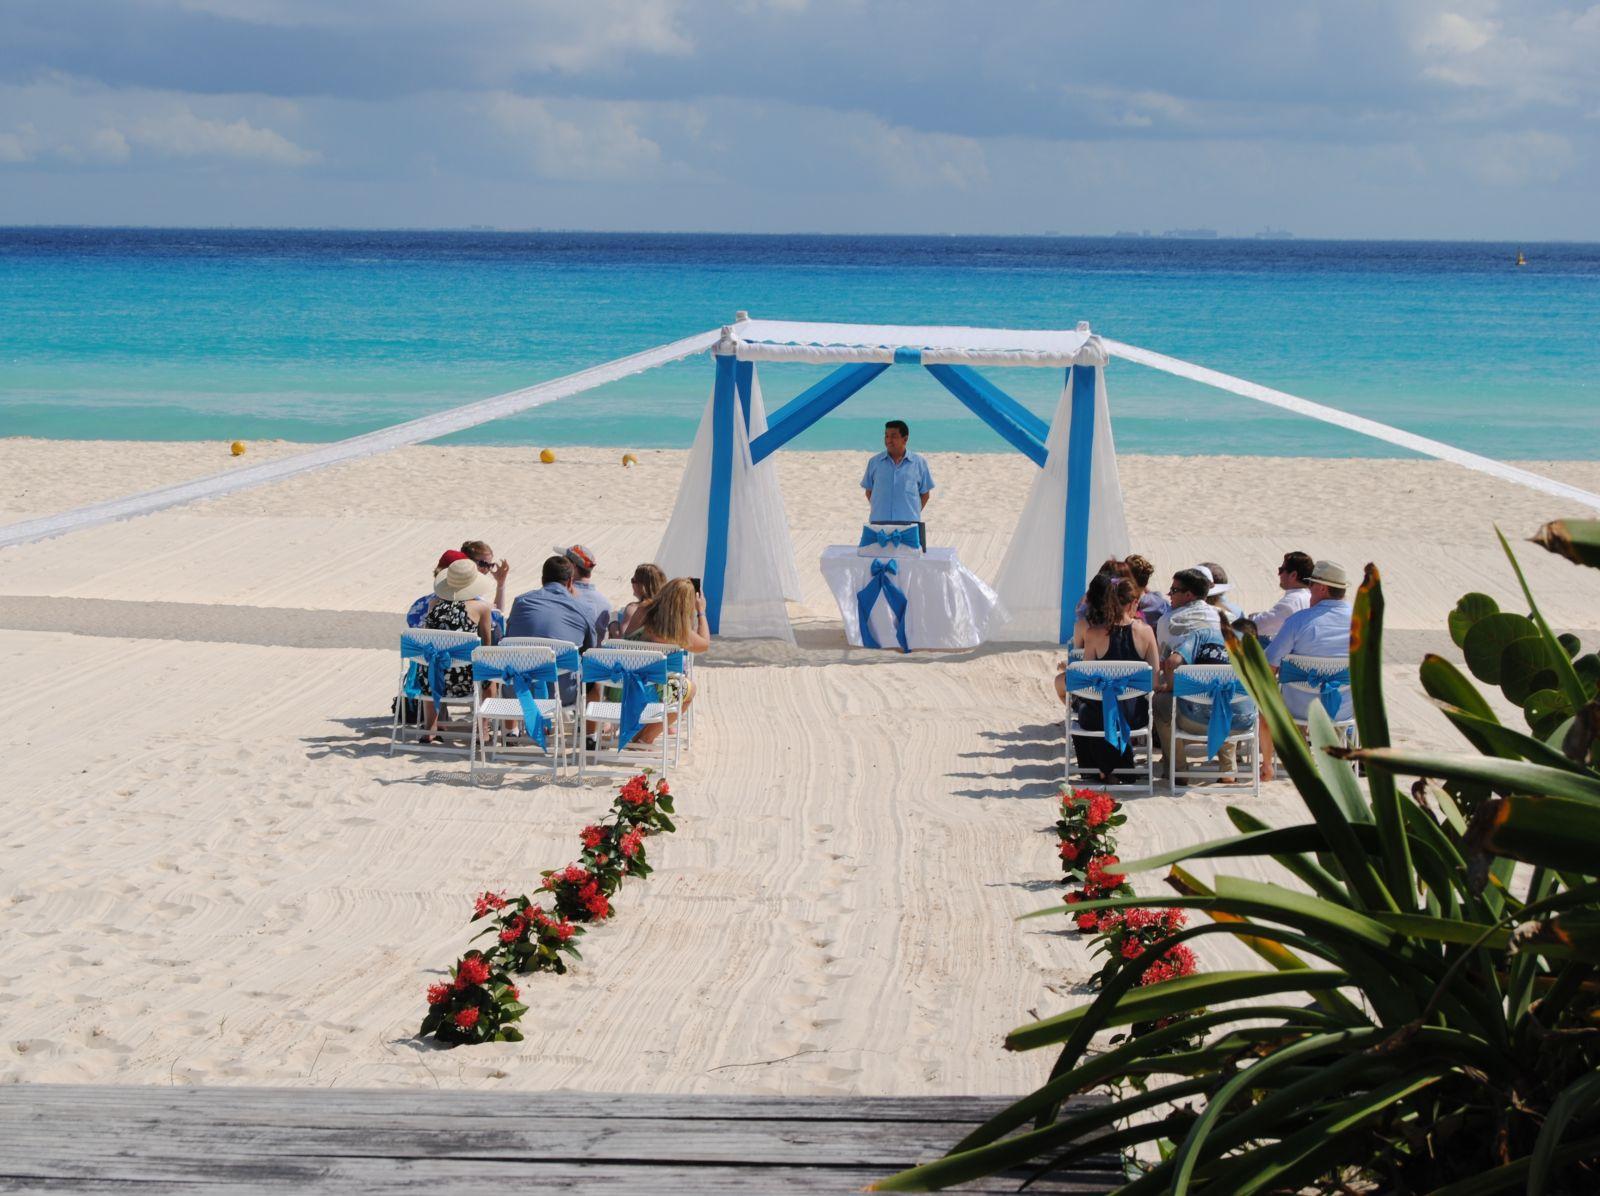 Our Wedding - Sandos Playacar